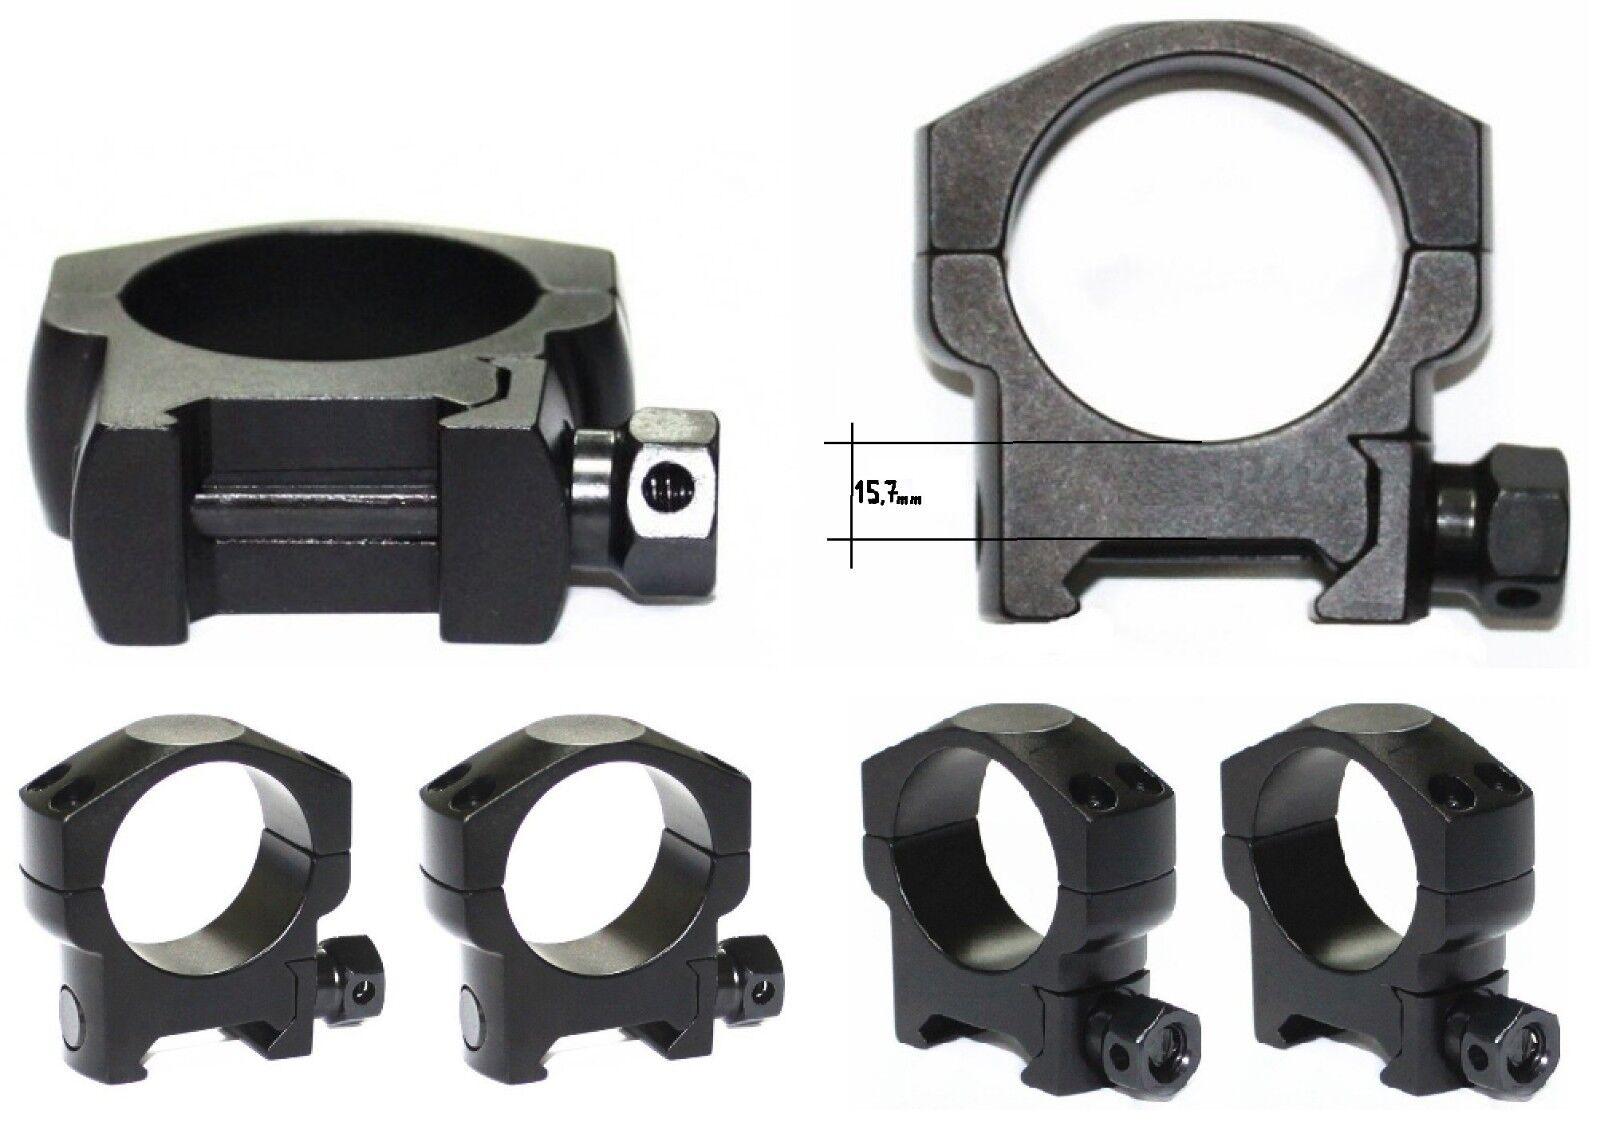 Anillas Altas Picatinny para Visores 30 mm de diámetro  Caza Rifles